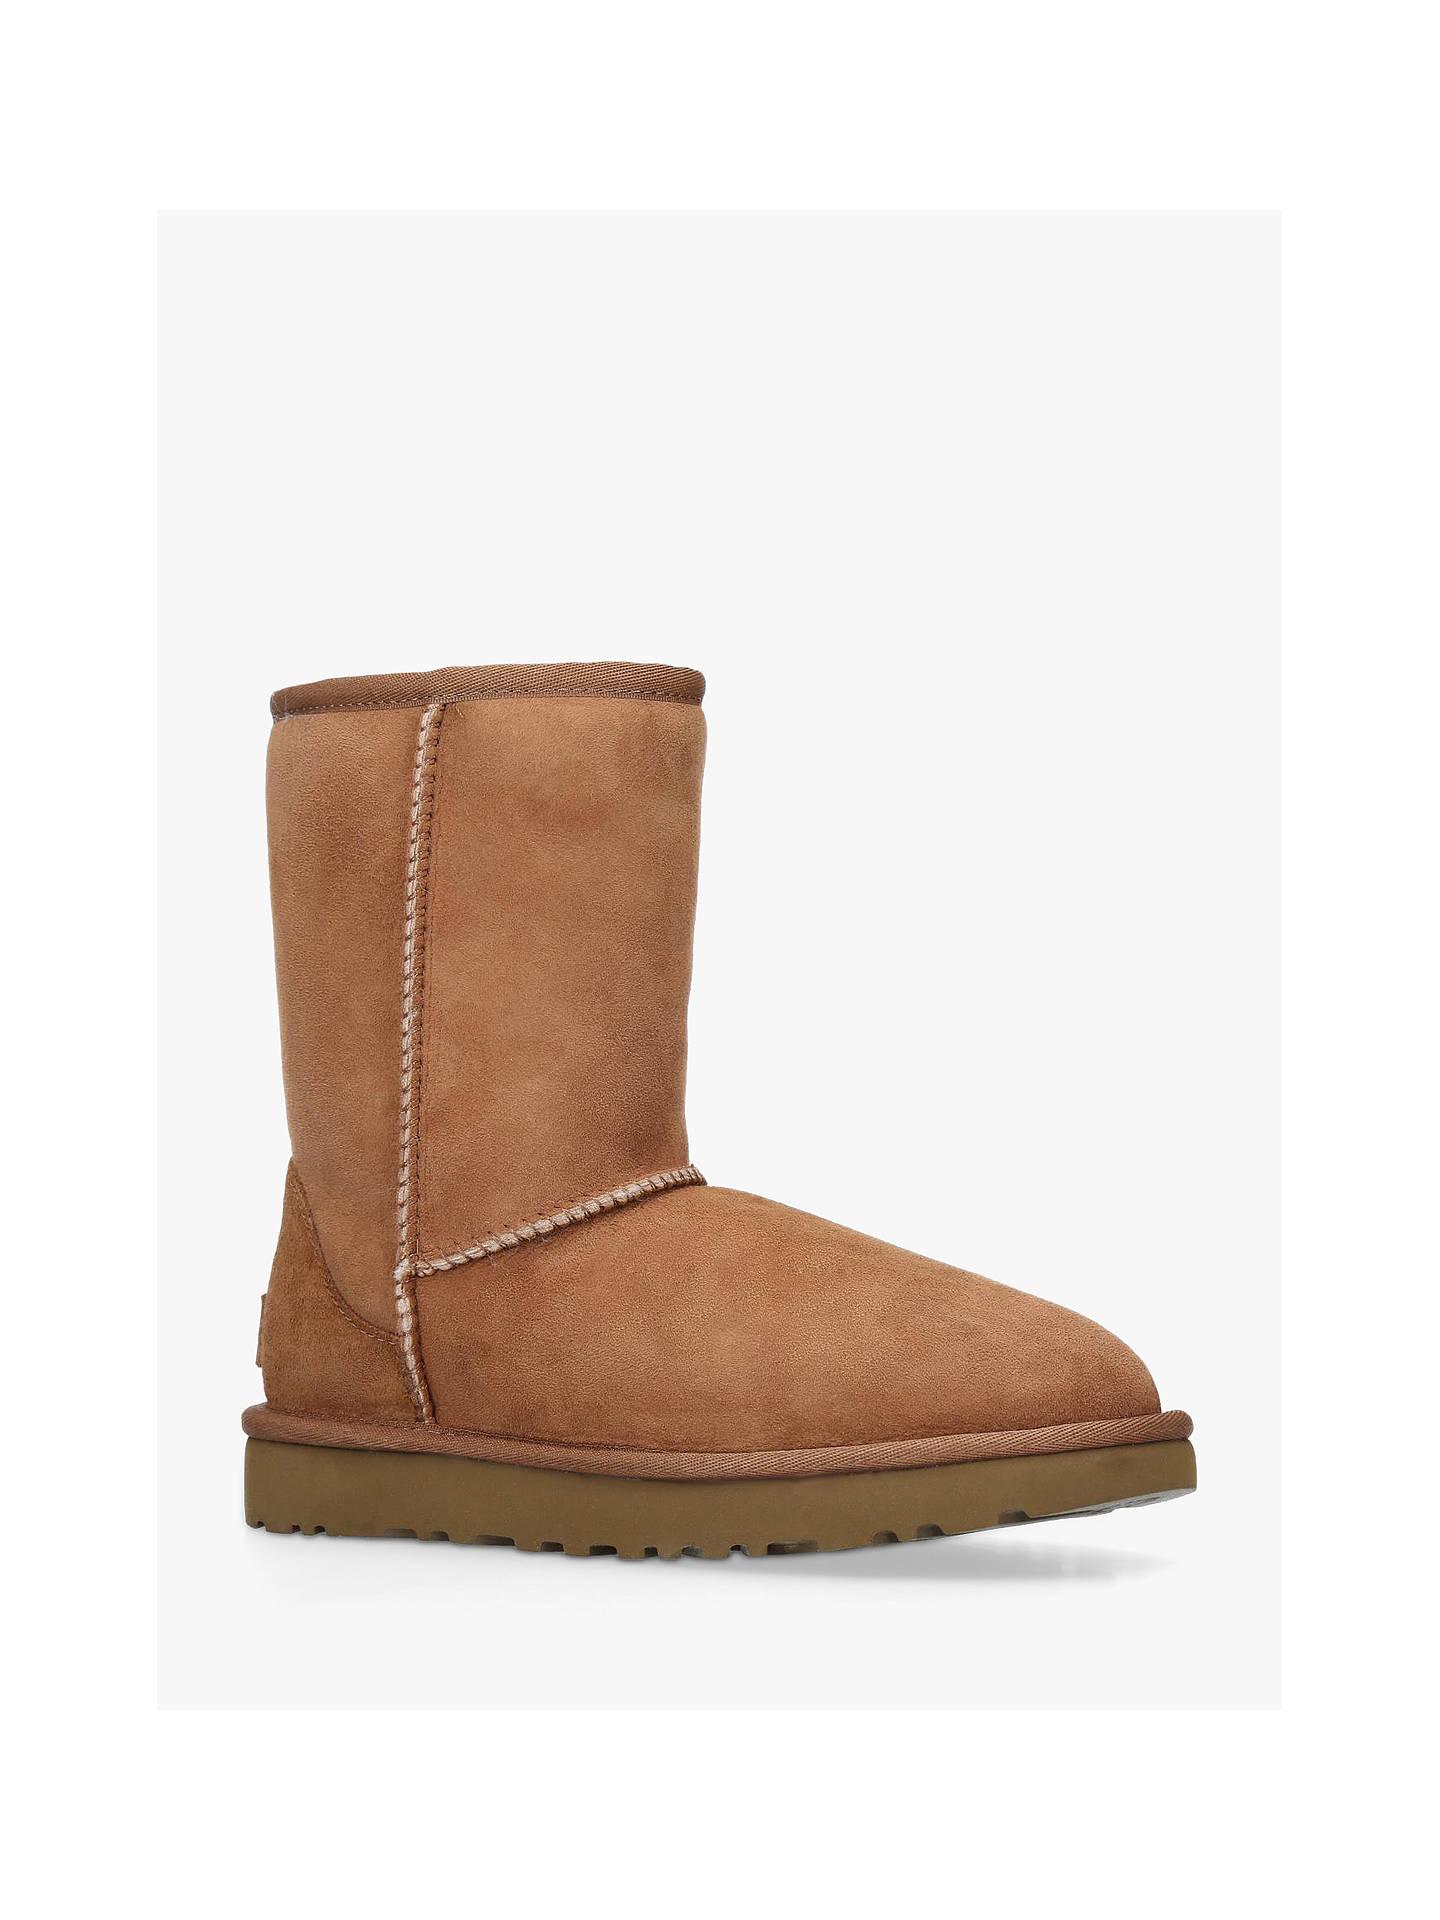 db76243472d UGG Classic II Short Sheepskin Ankle Boots, Chestnut